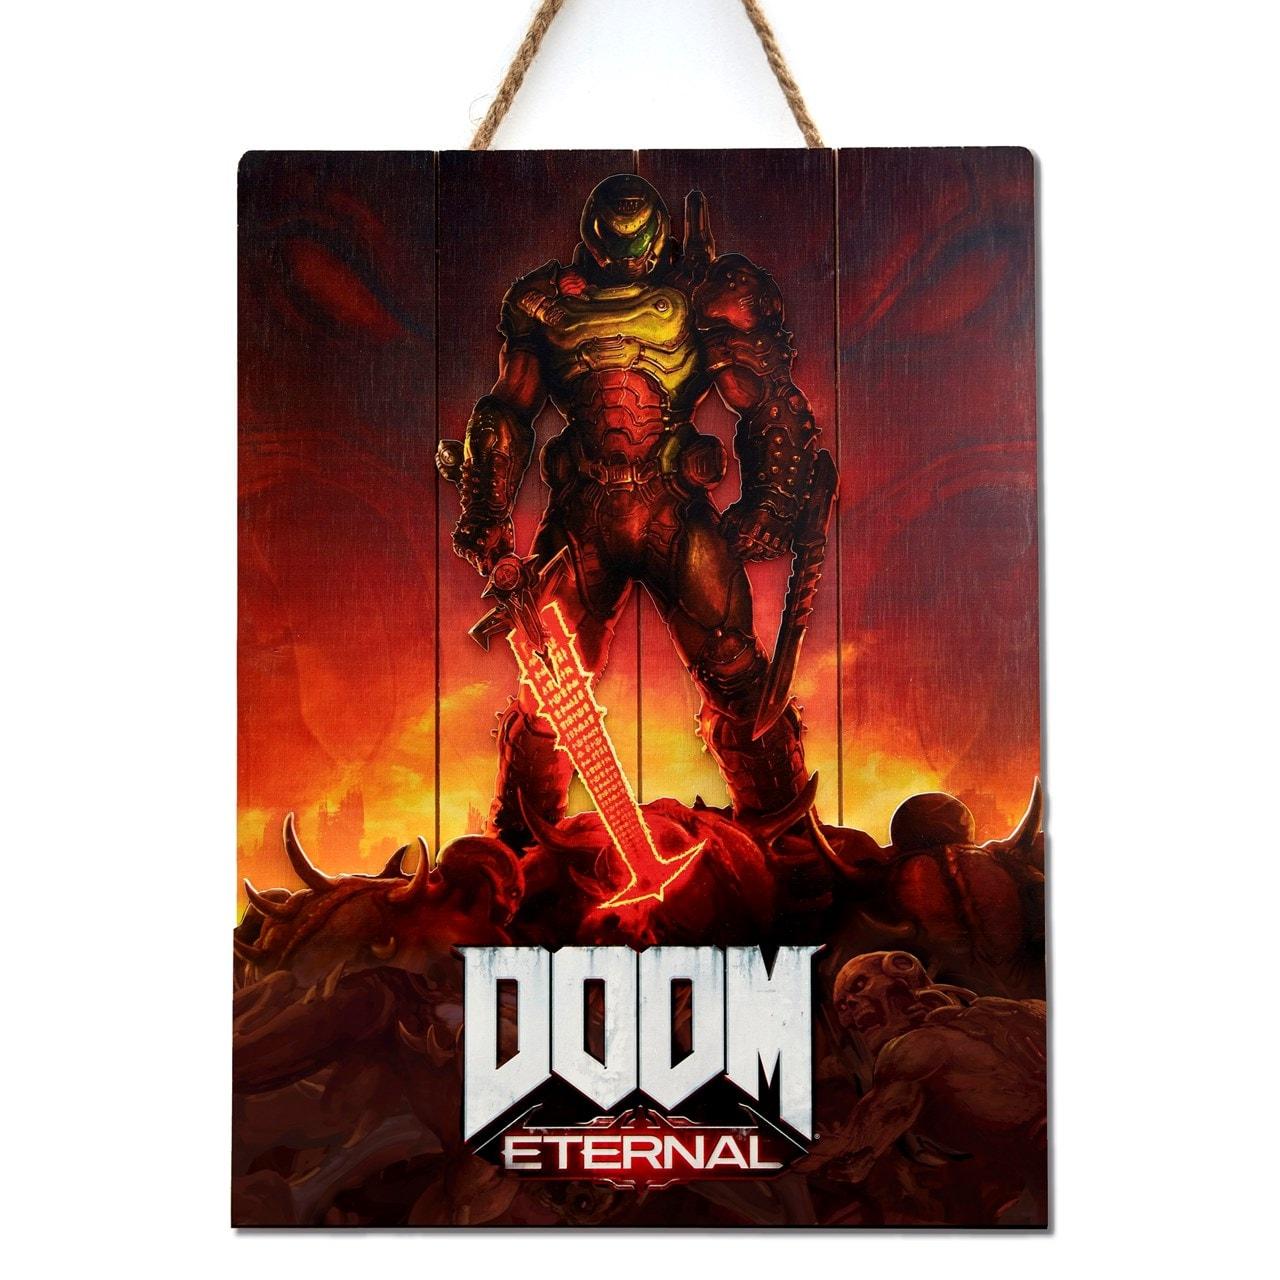 doom eternal limited edition 3d wood art wall art free shipping over 20 hmv store